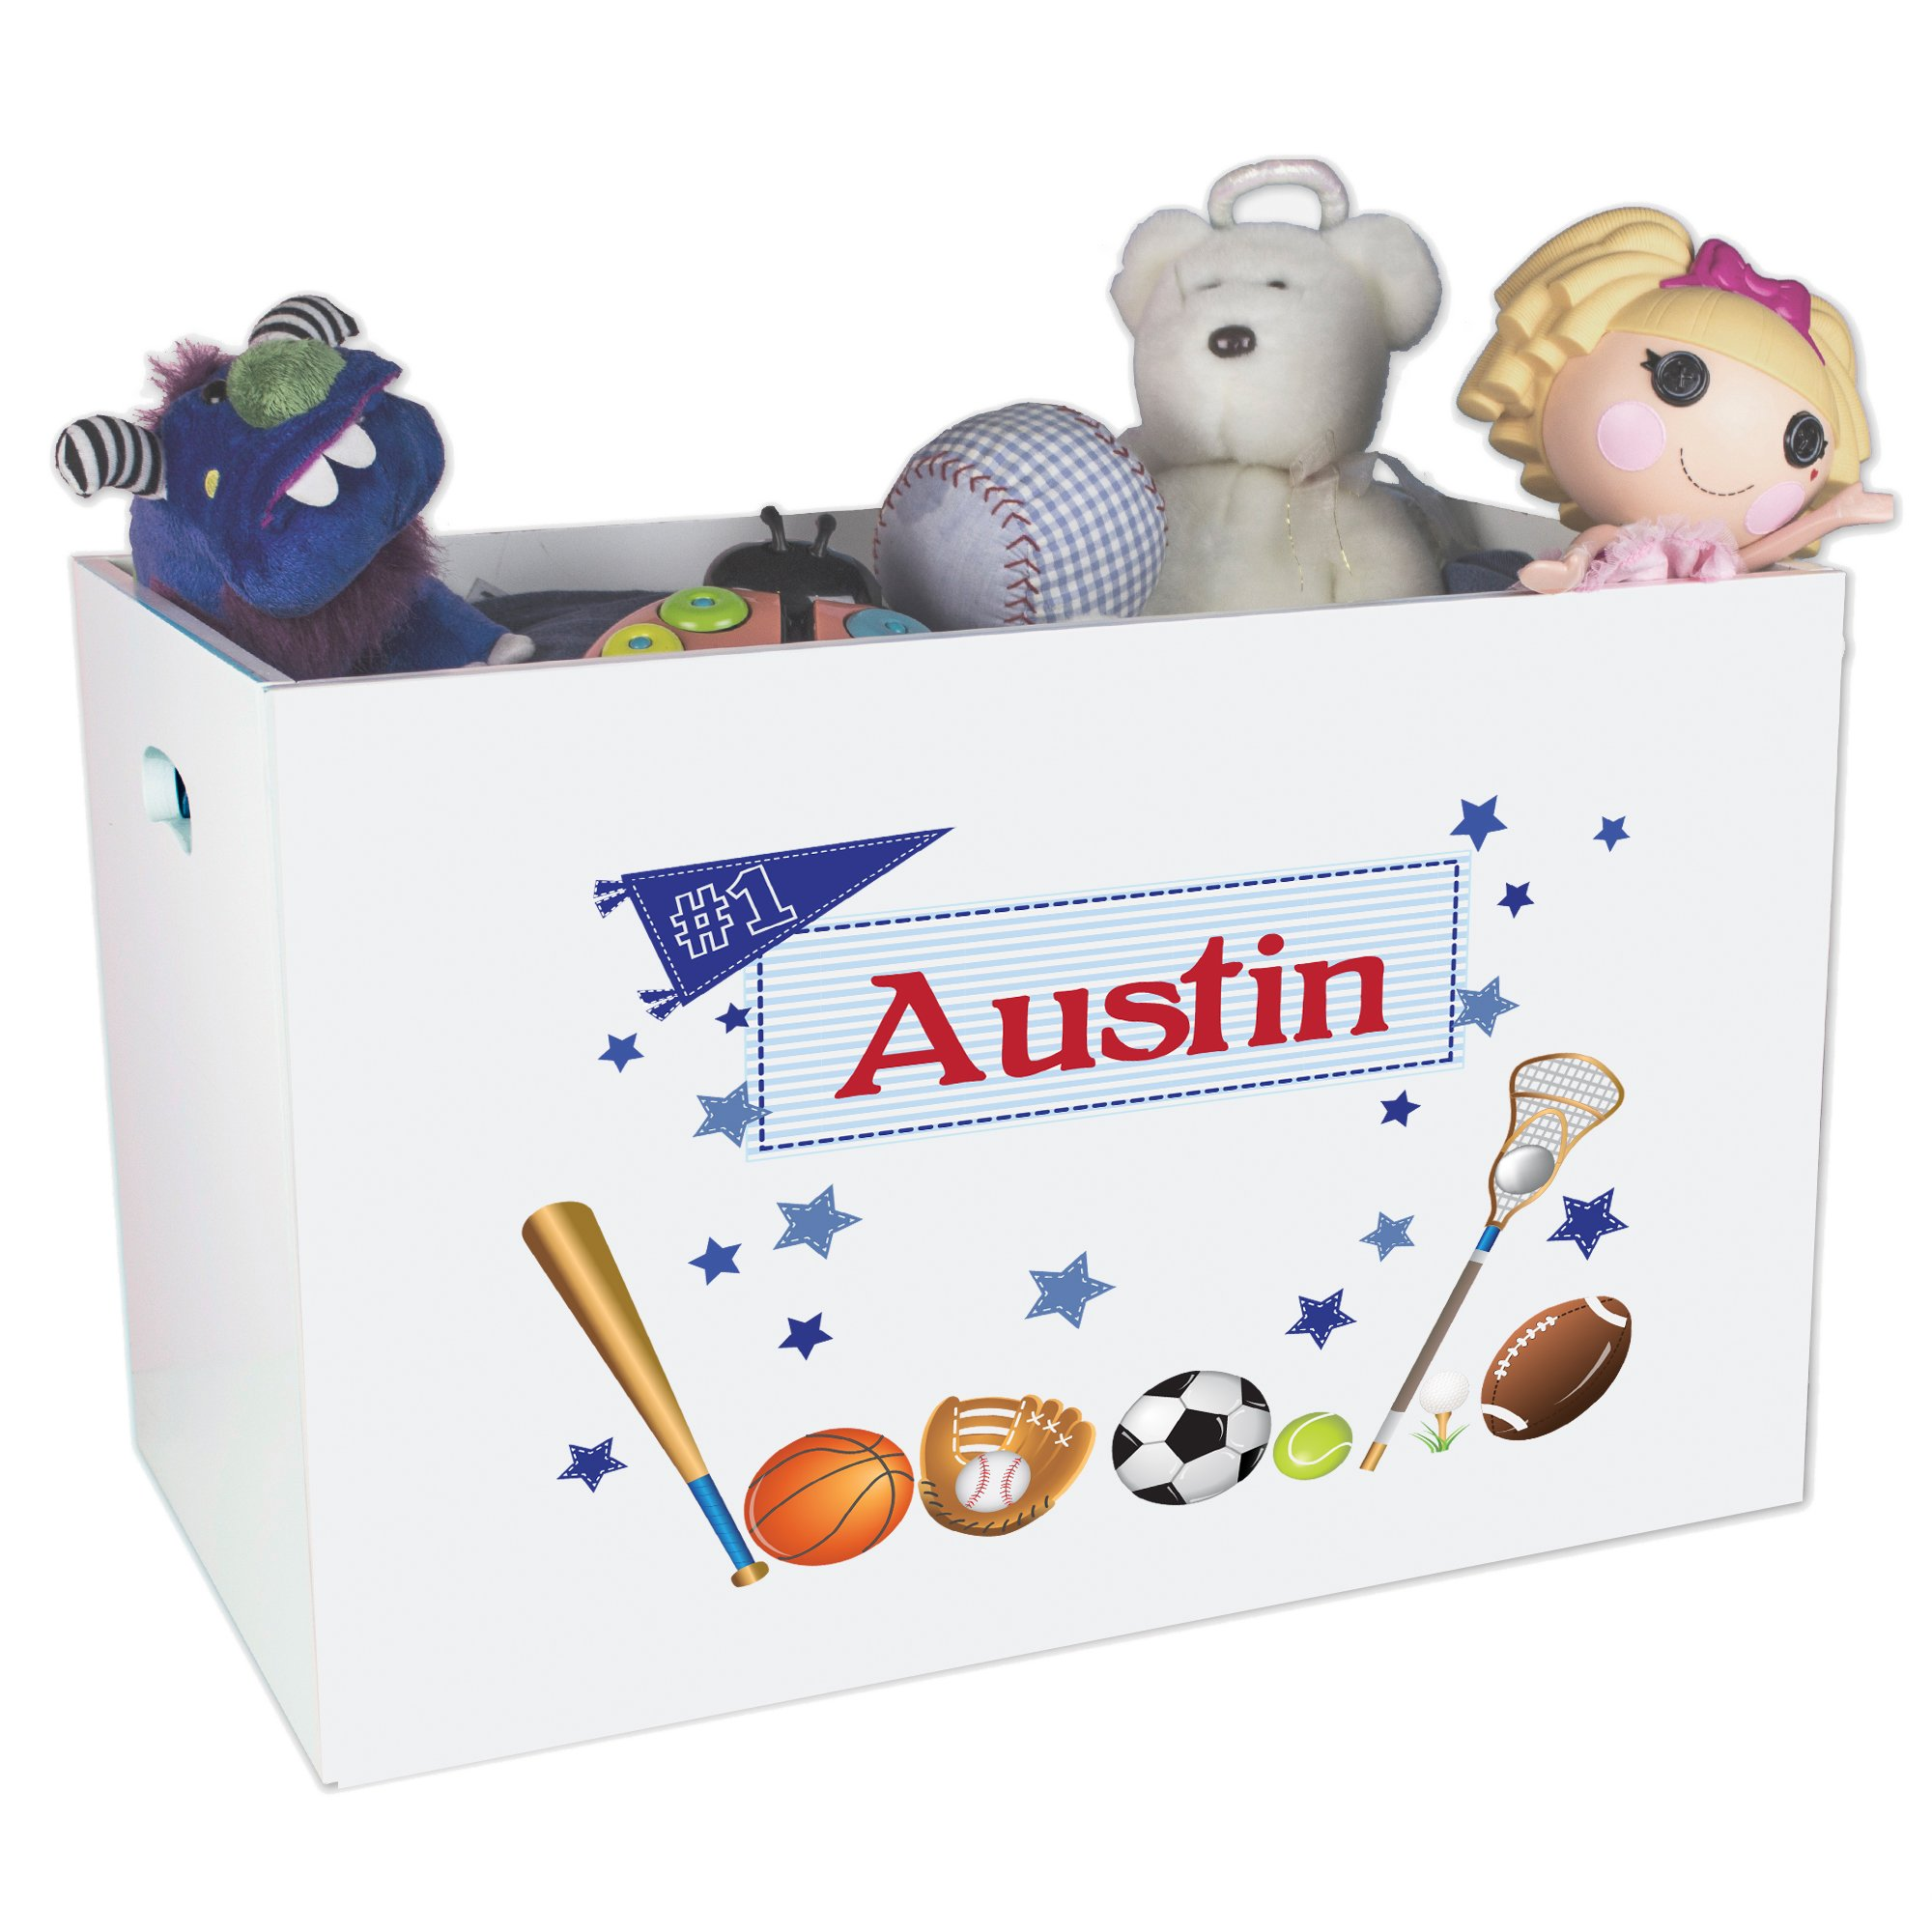 Personalized Sports Childrens Nursery White Open Toy Box by MyBambino